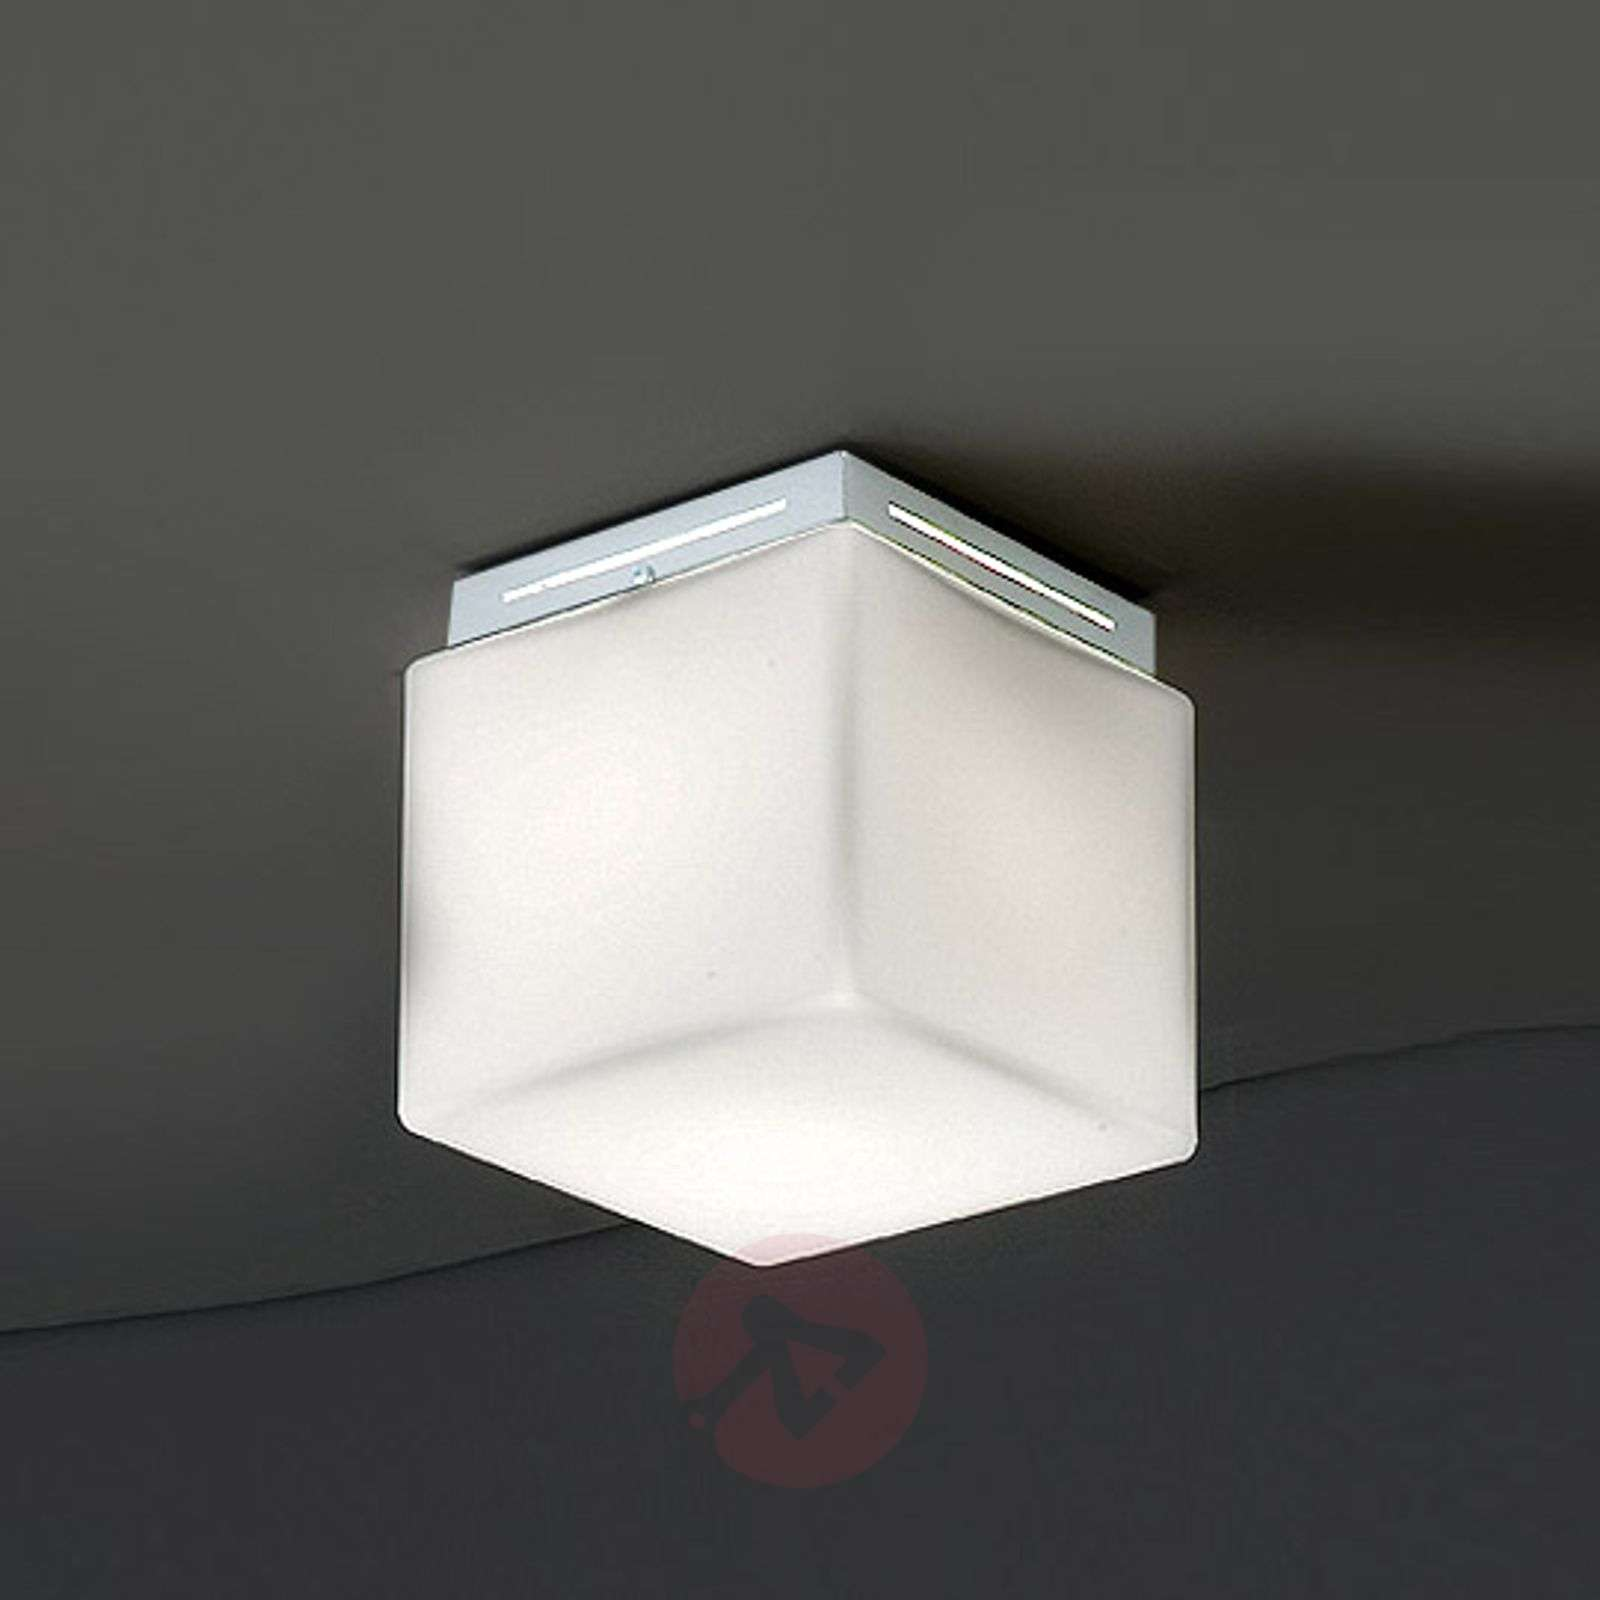 Ceiling light Cubis-1053012X-01